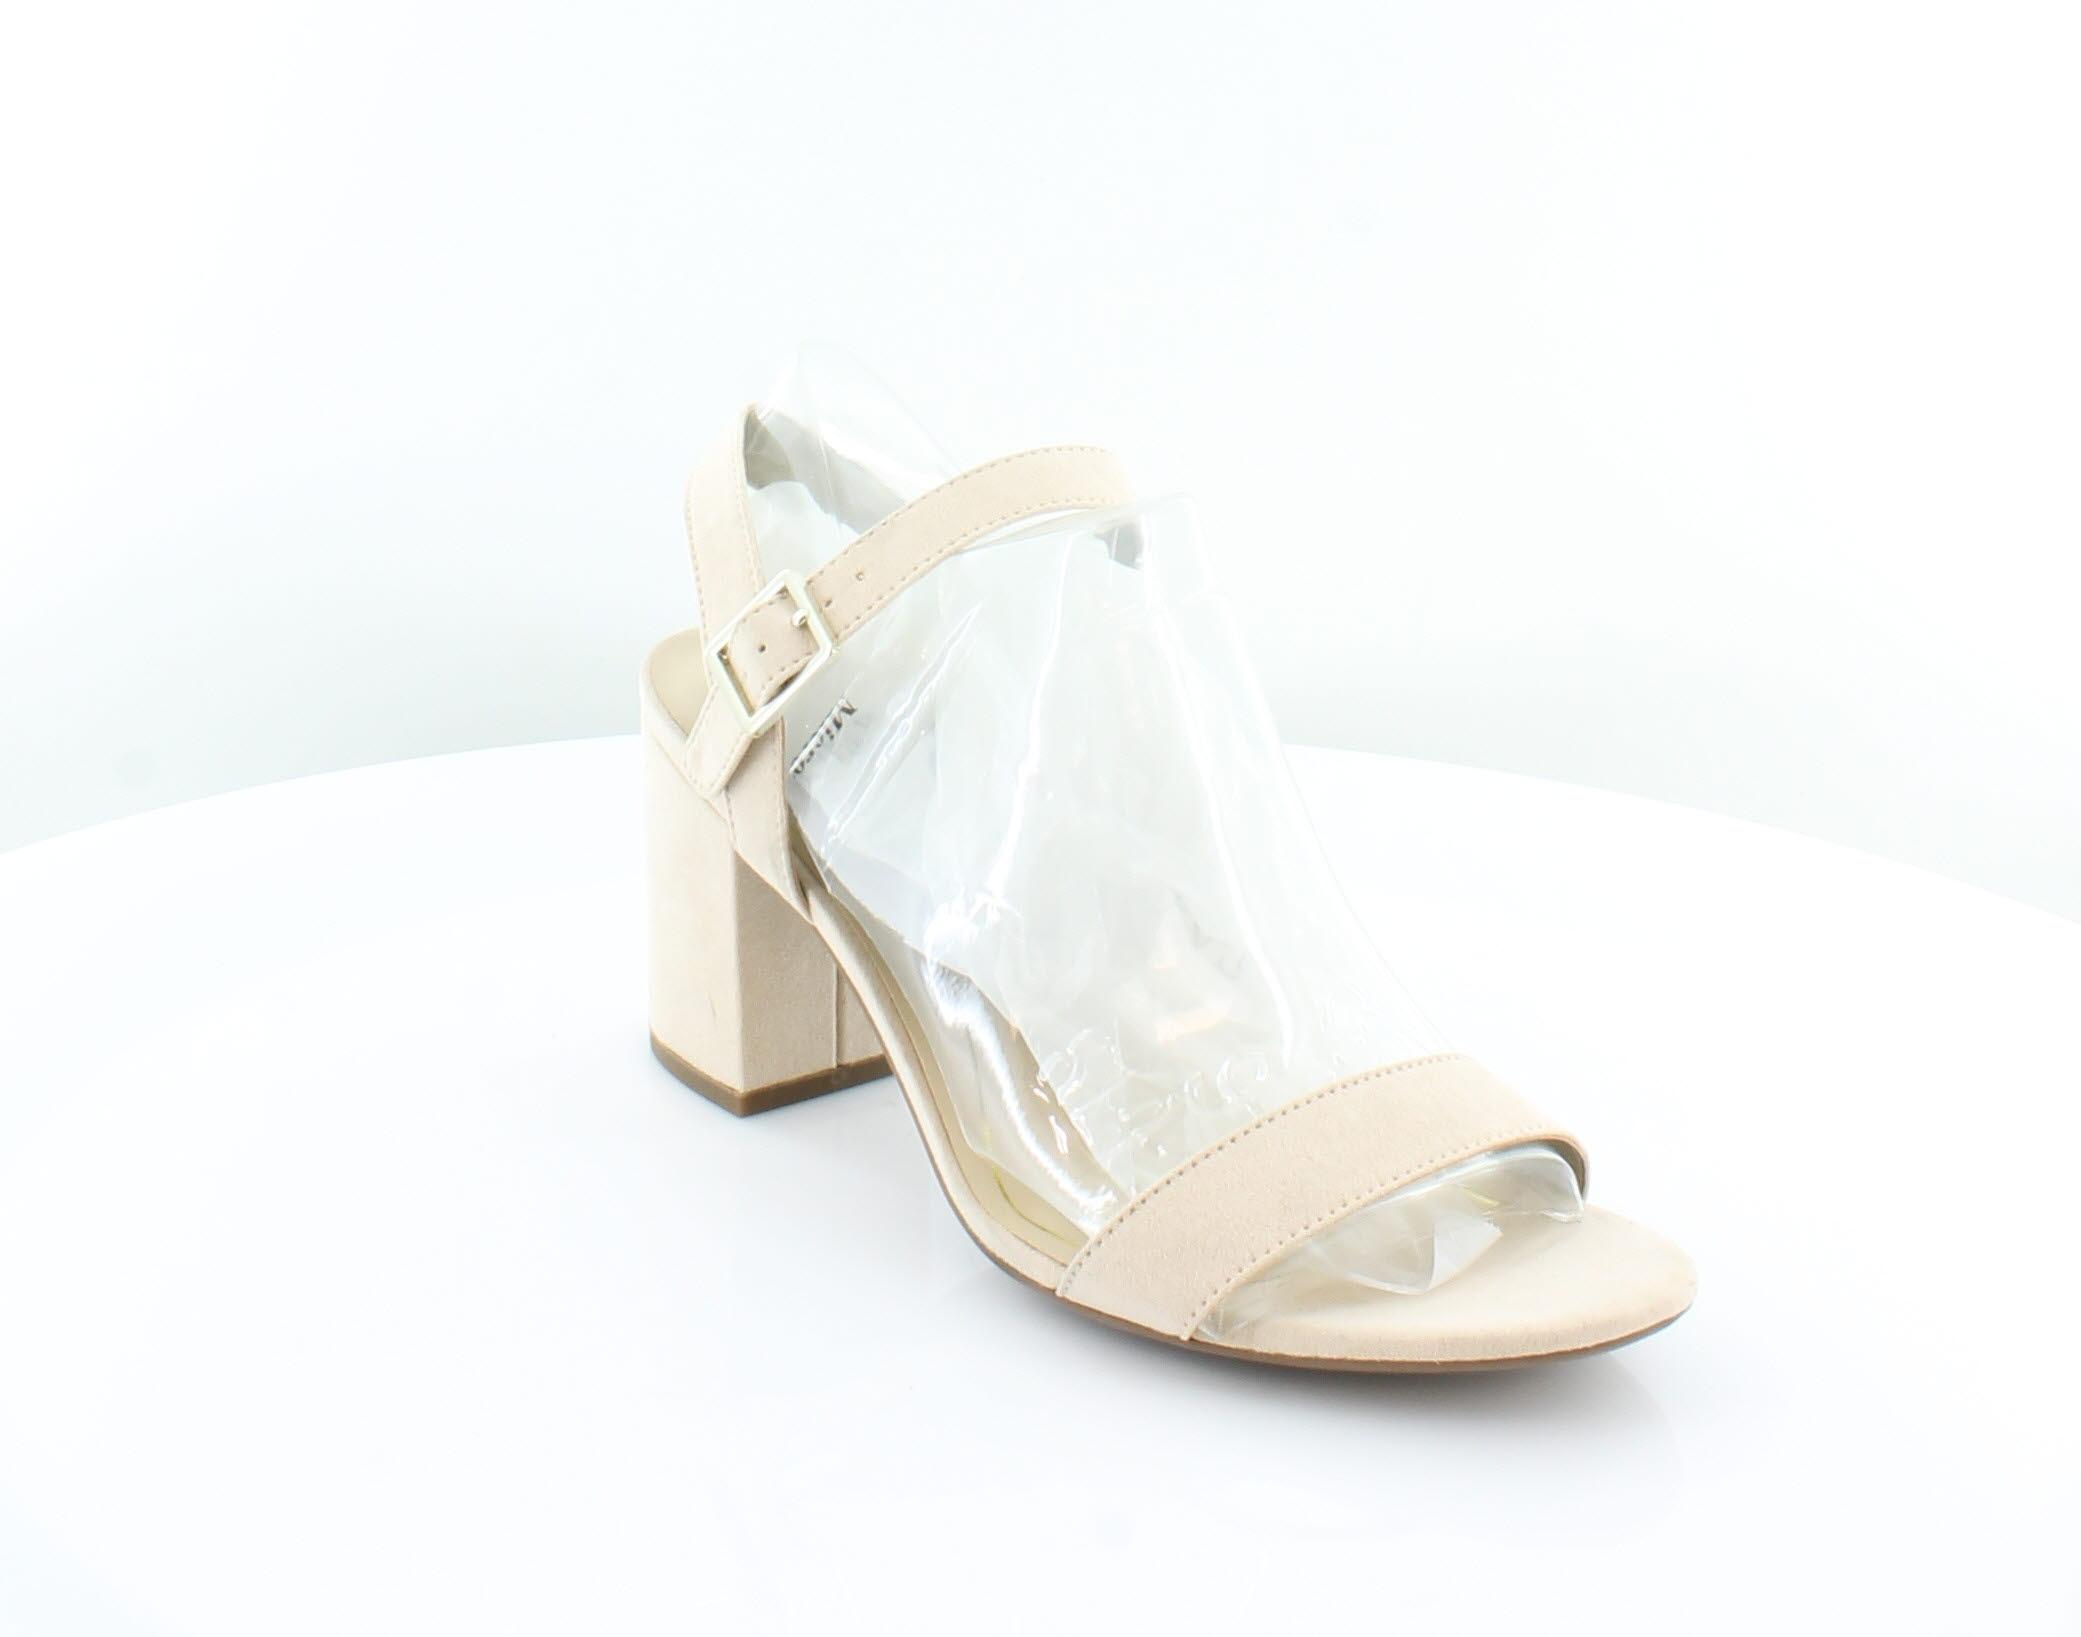 70ea666cd5f5 Circus by Sam Edelman Ashton Beige Womens Shoes Size 9.5 M Sandals MSRP  59